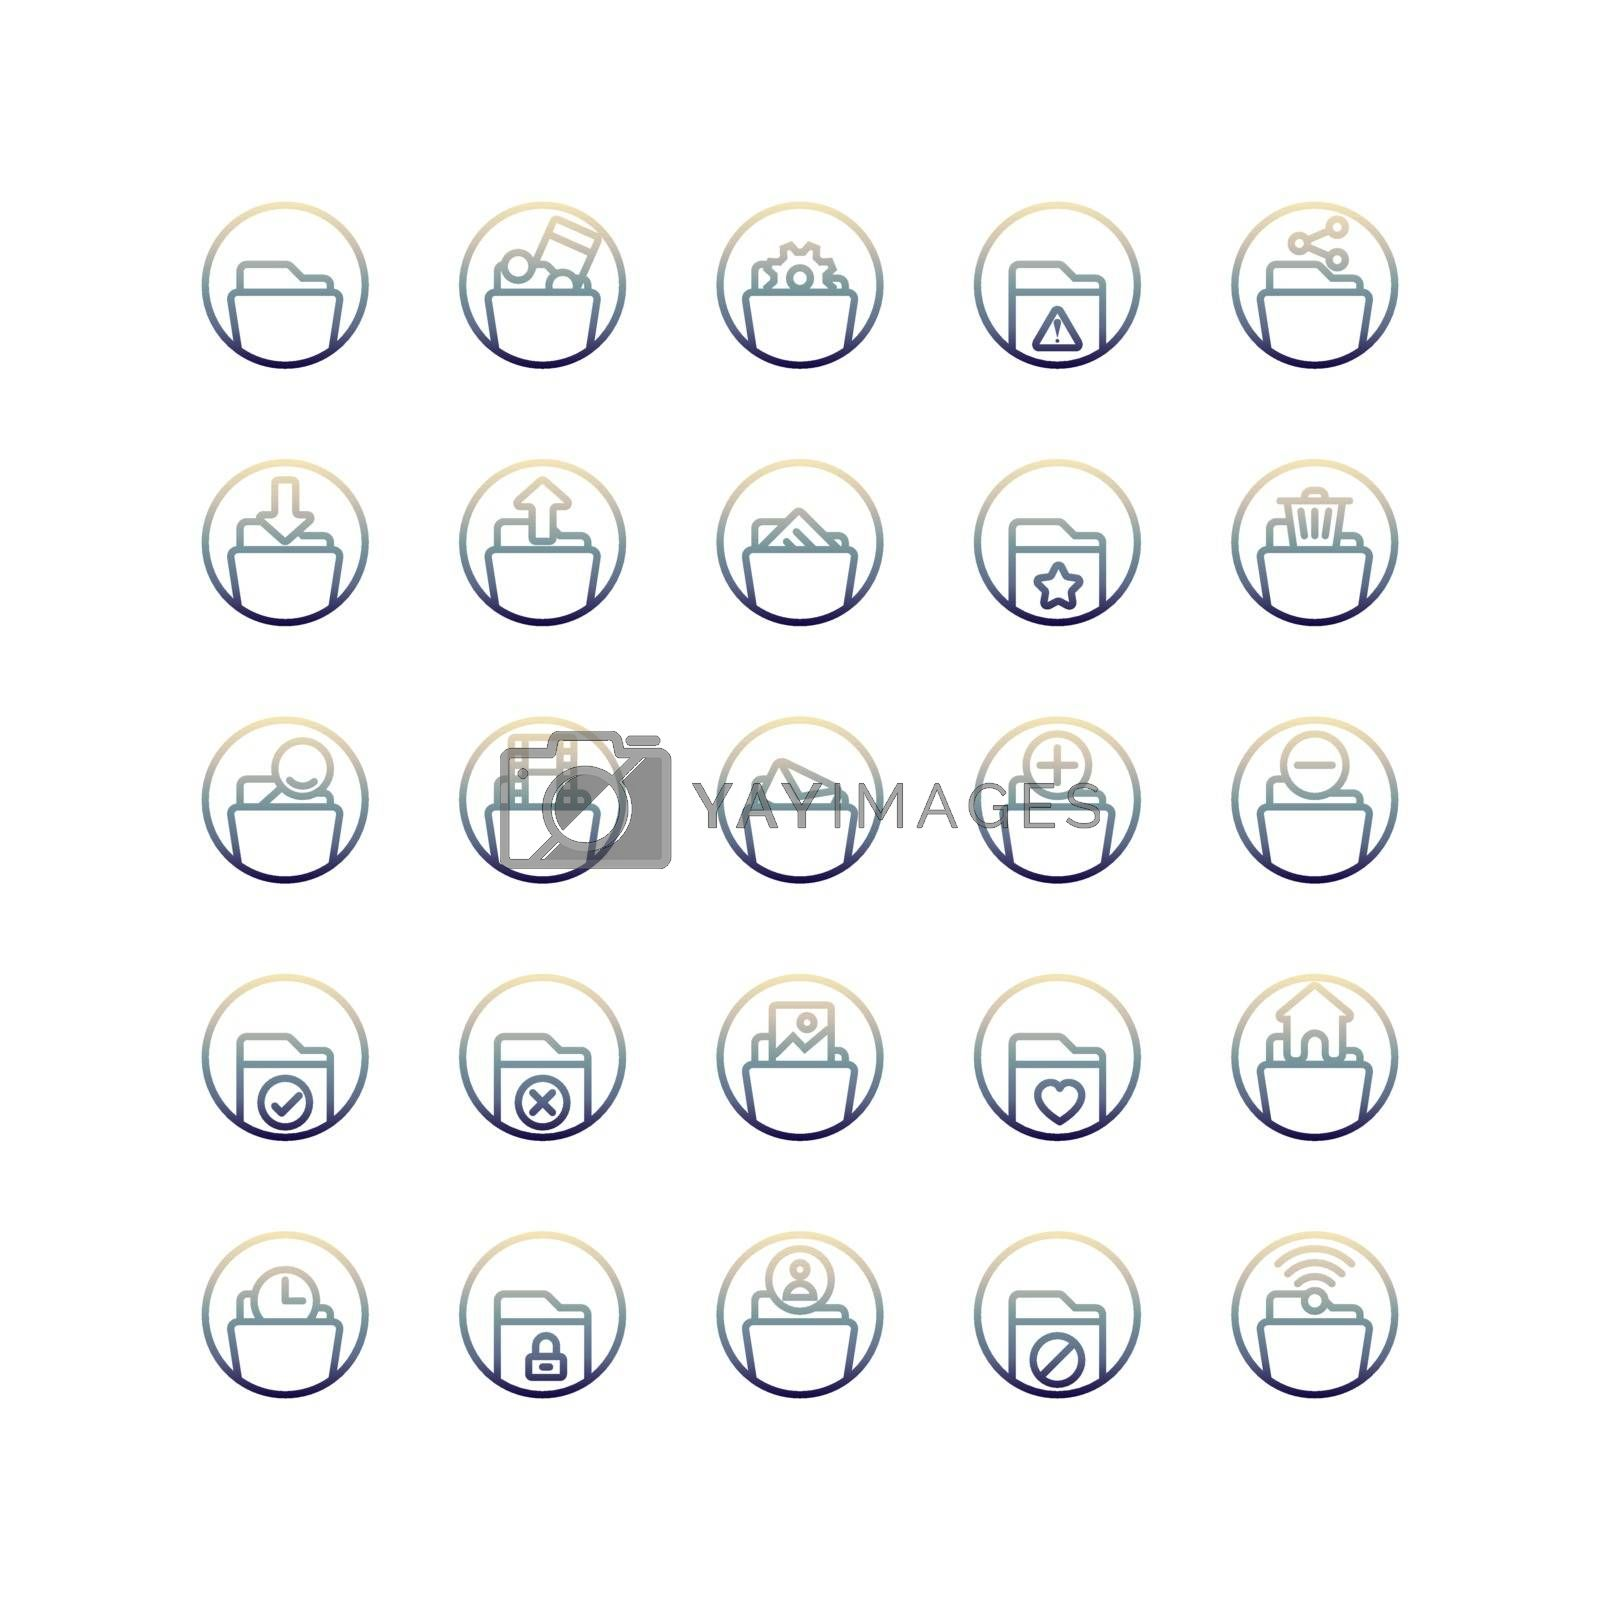 Folder gradient icon set. Vector and Illustration.